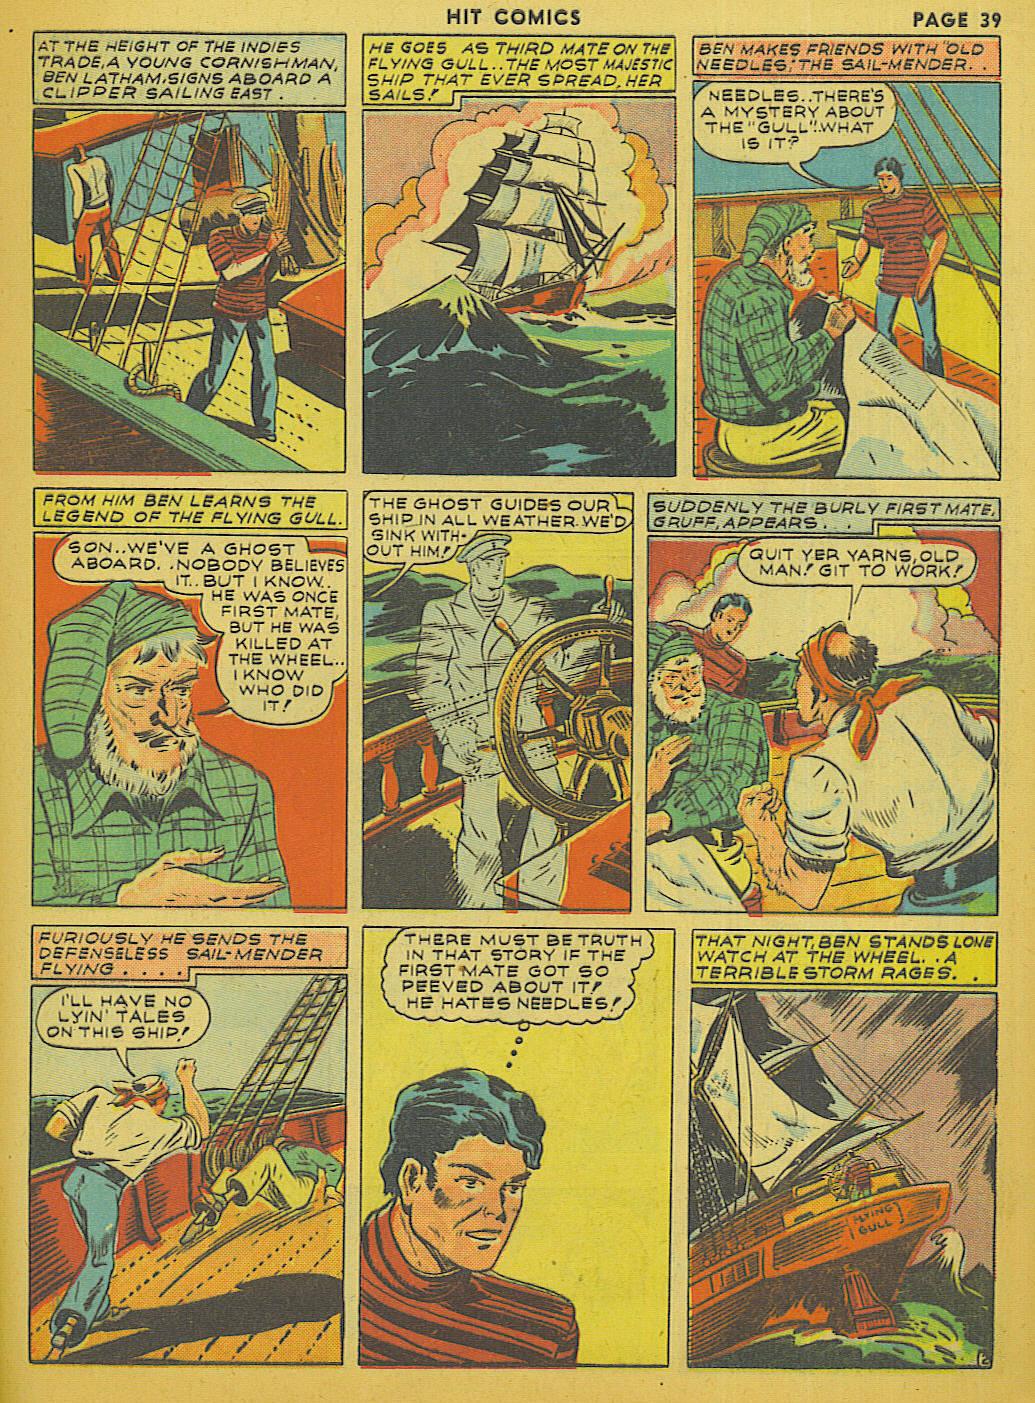 Read online Hit Comics comic -  Issue #13 - 41